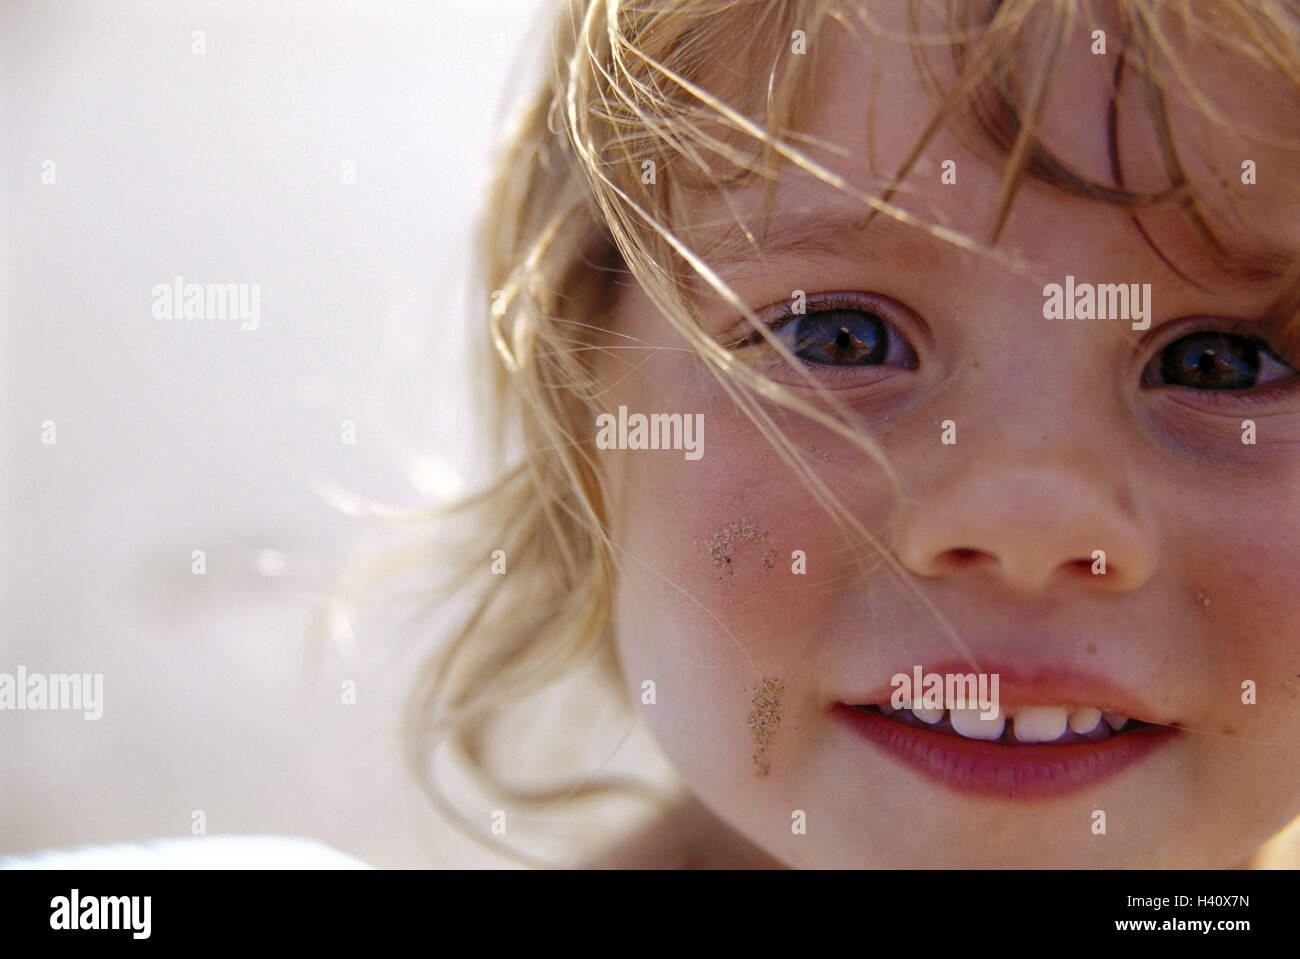 Mädchen, Lächeln, Strahlen locken, Blond, Porträt, Kind, Kind Portrait, gewellt, Säuglings, Stockbild